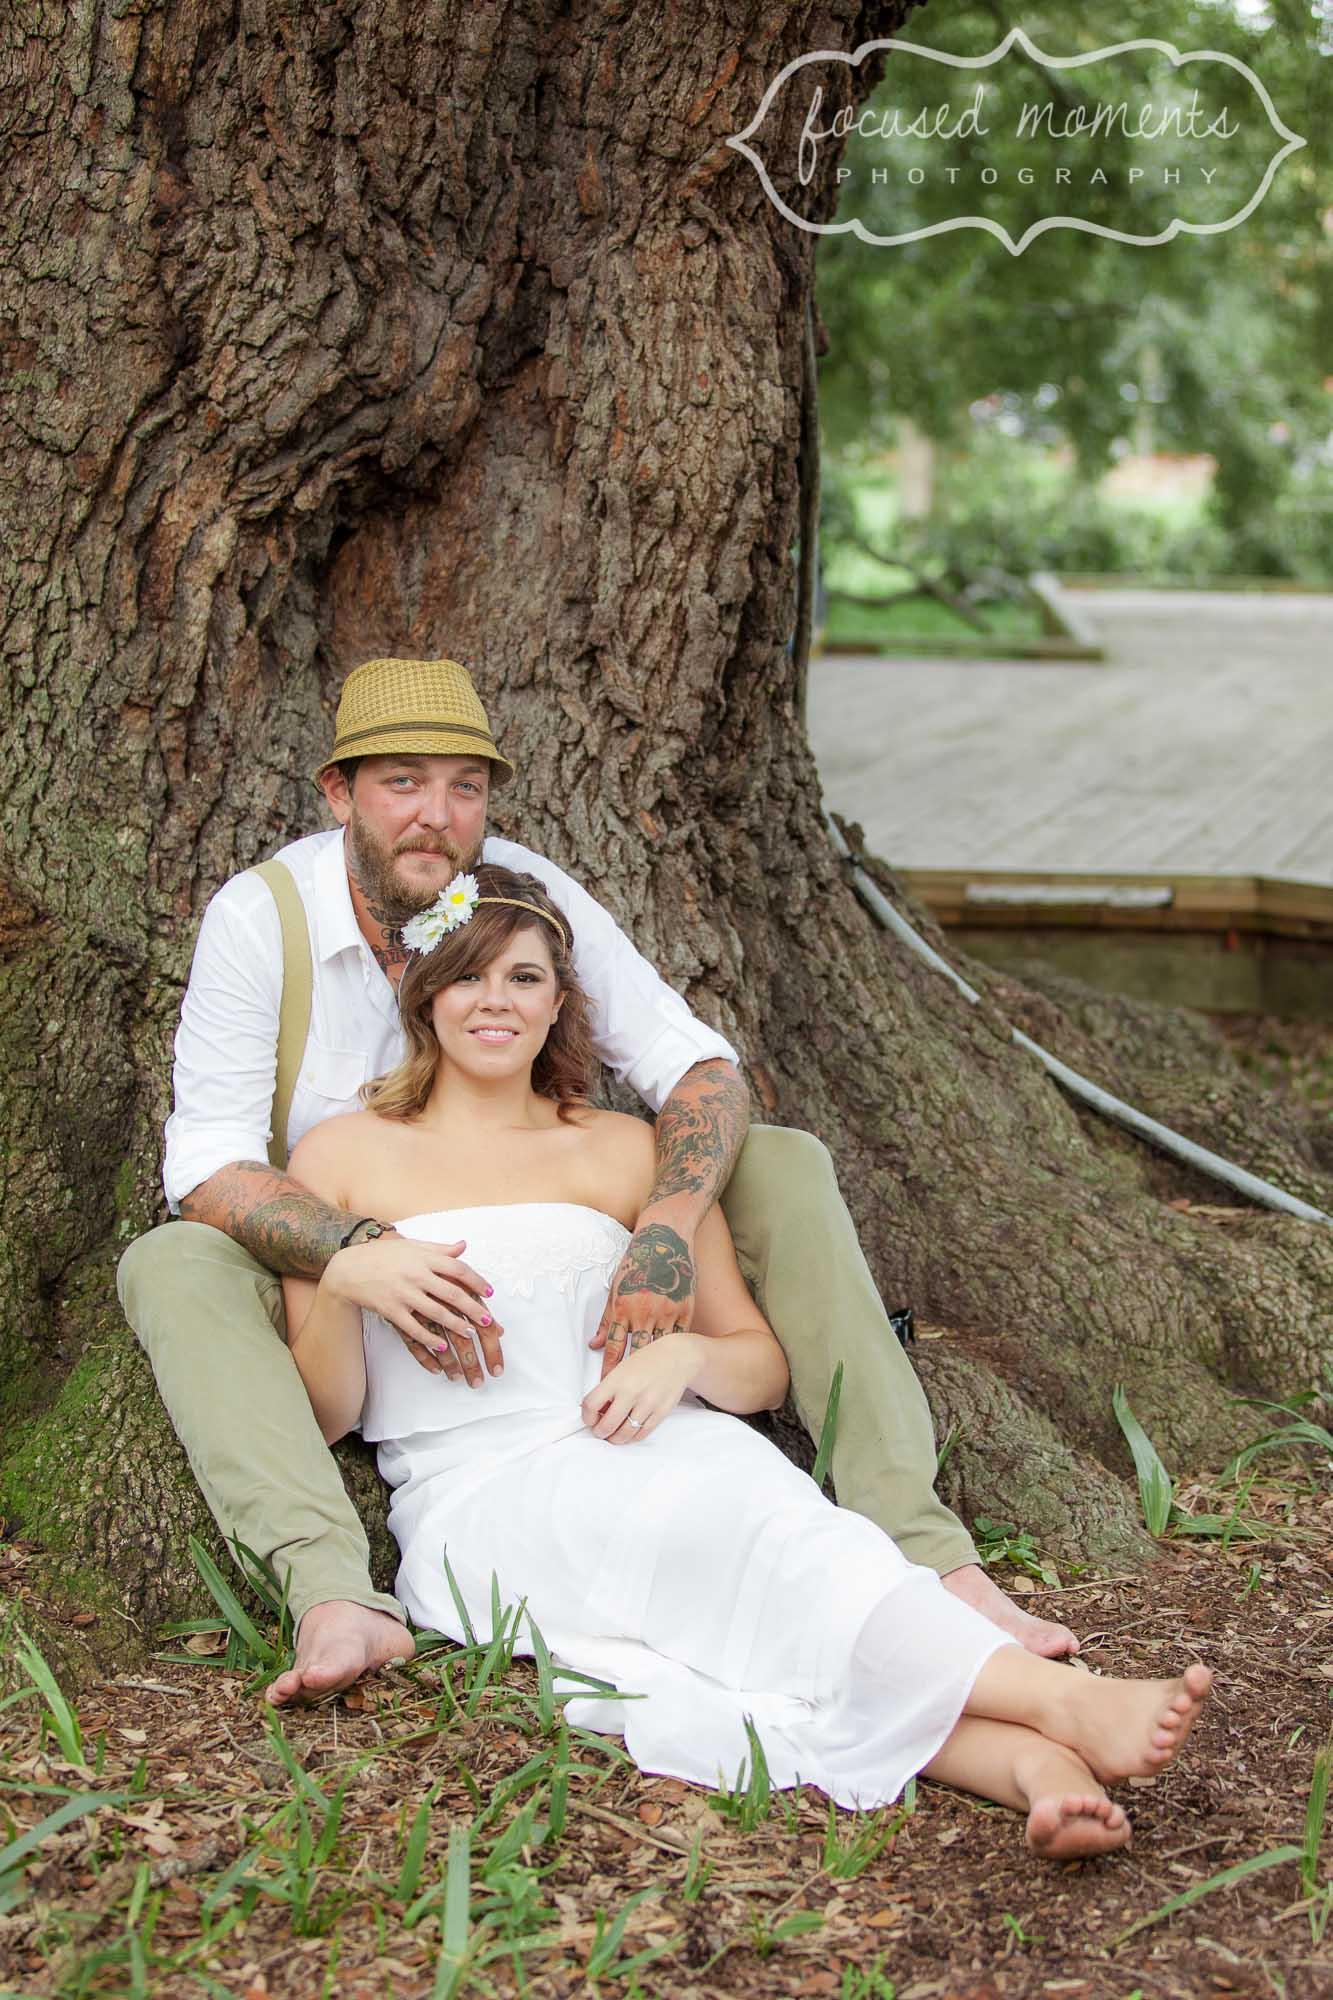 2013_08_03_Treaty_Oaks_Park_Jacksonville_Engagement_Photography_03.jpg